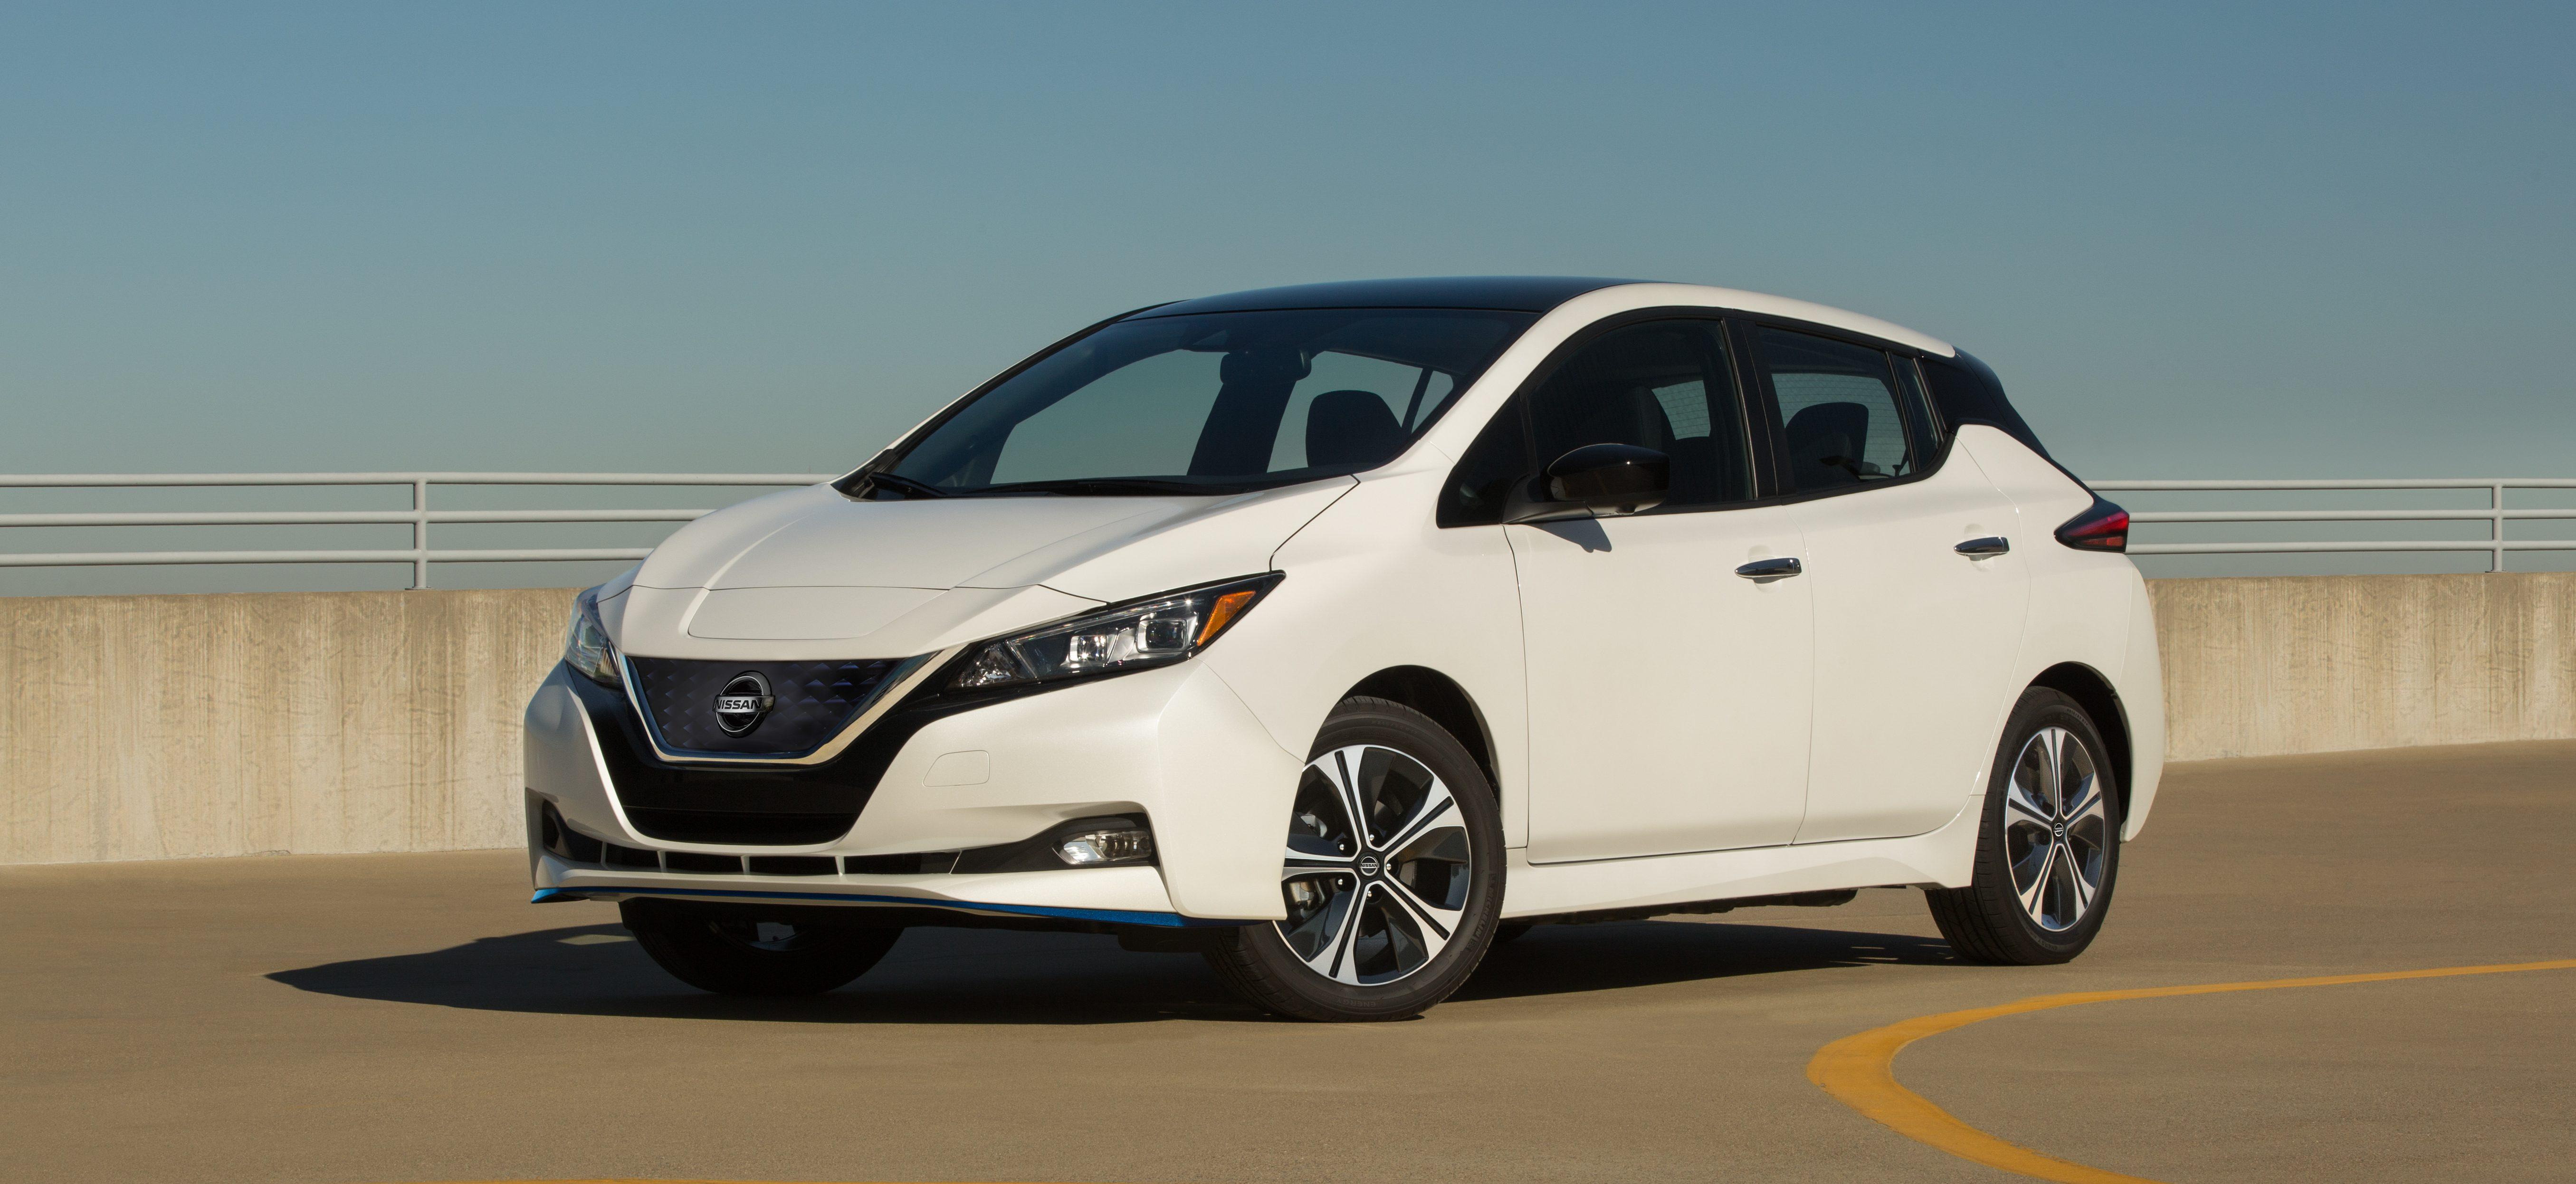 2020 Nissan Leaf Range Release Date